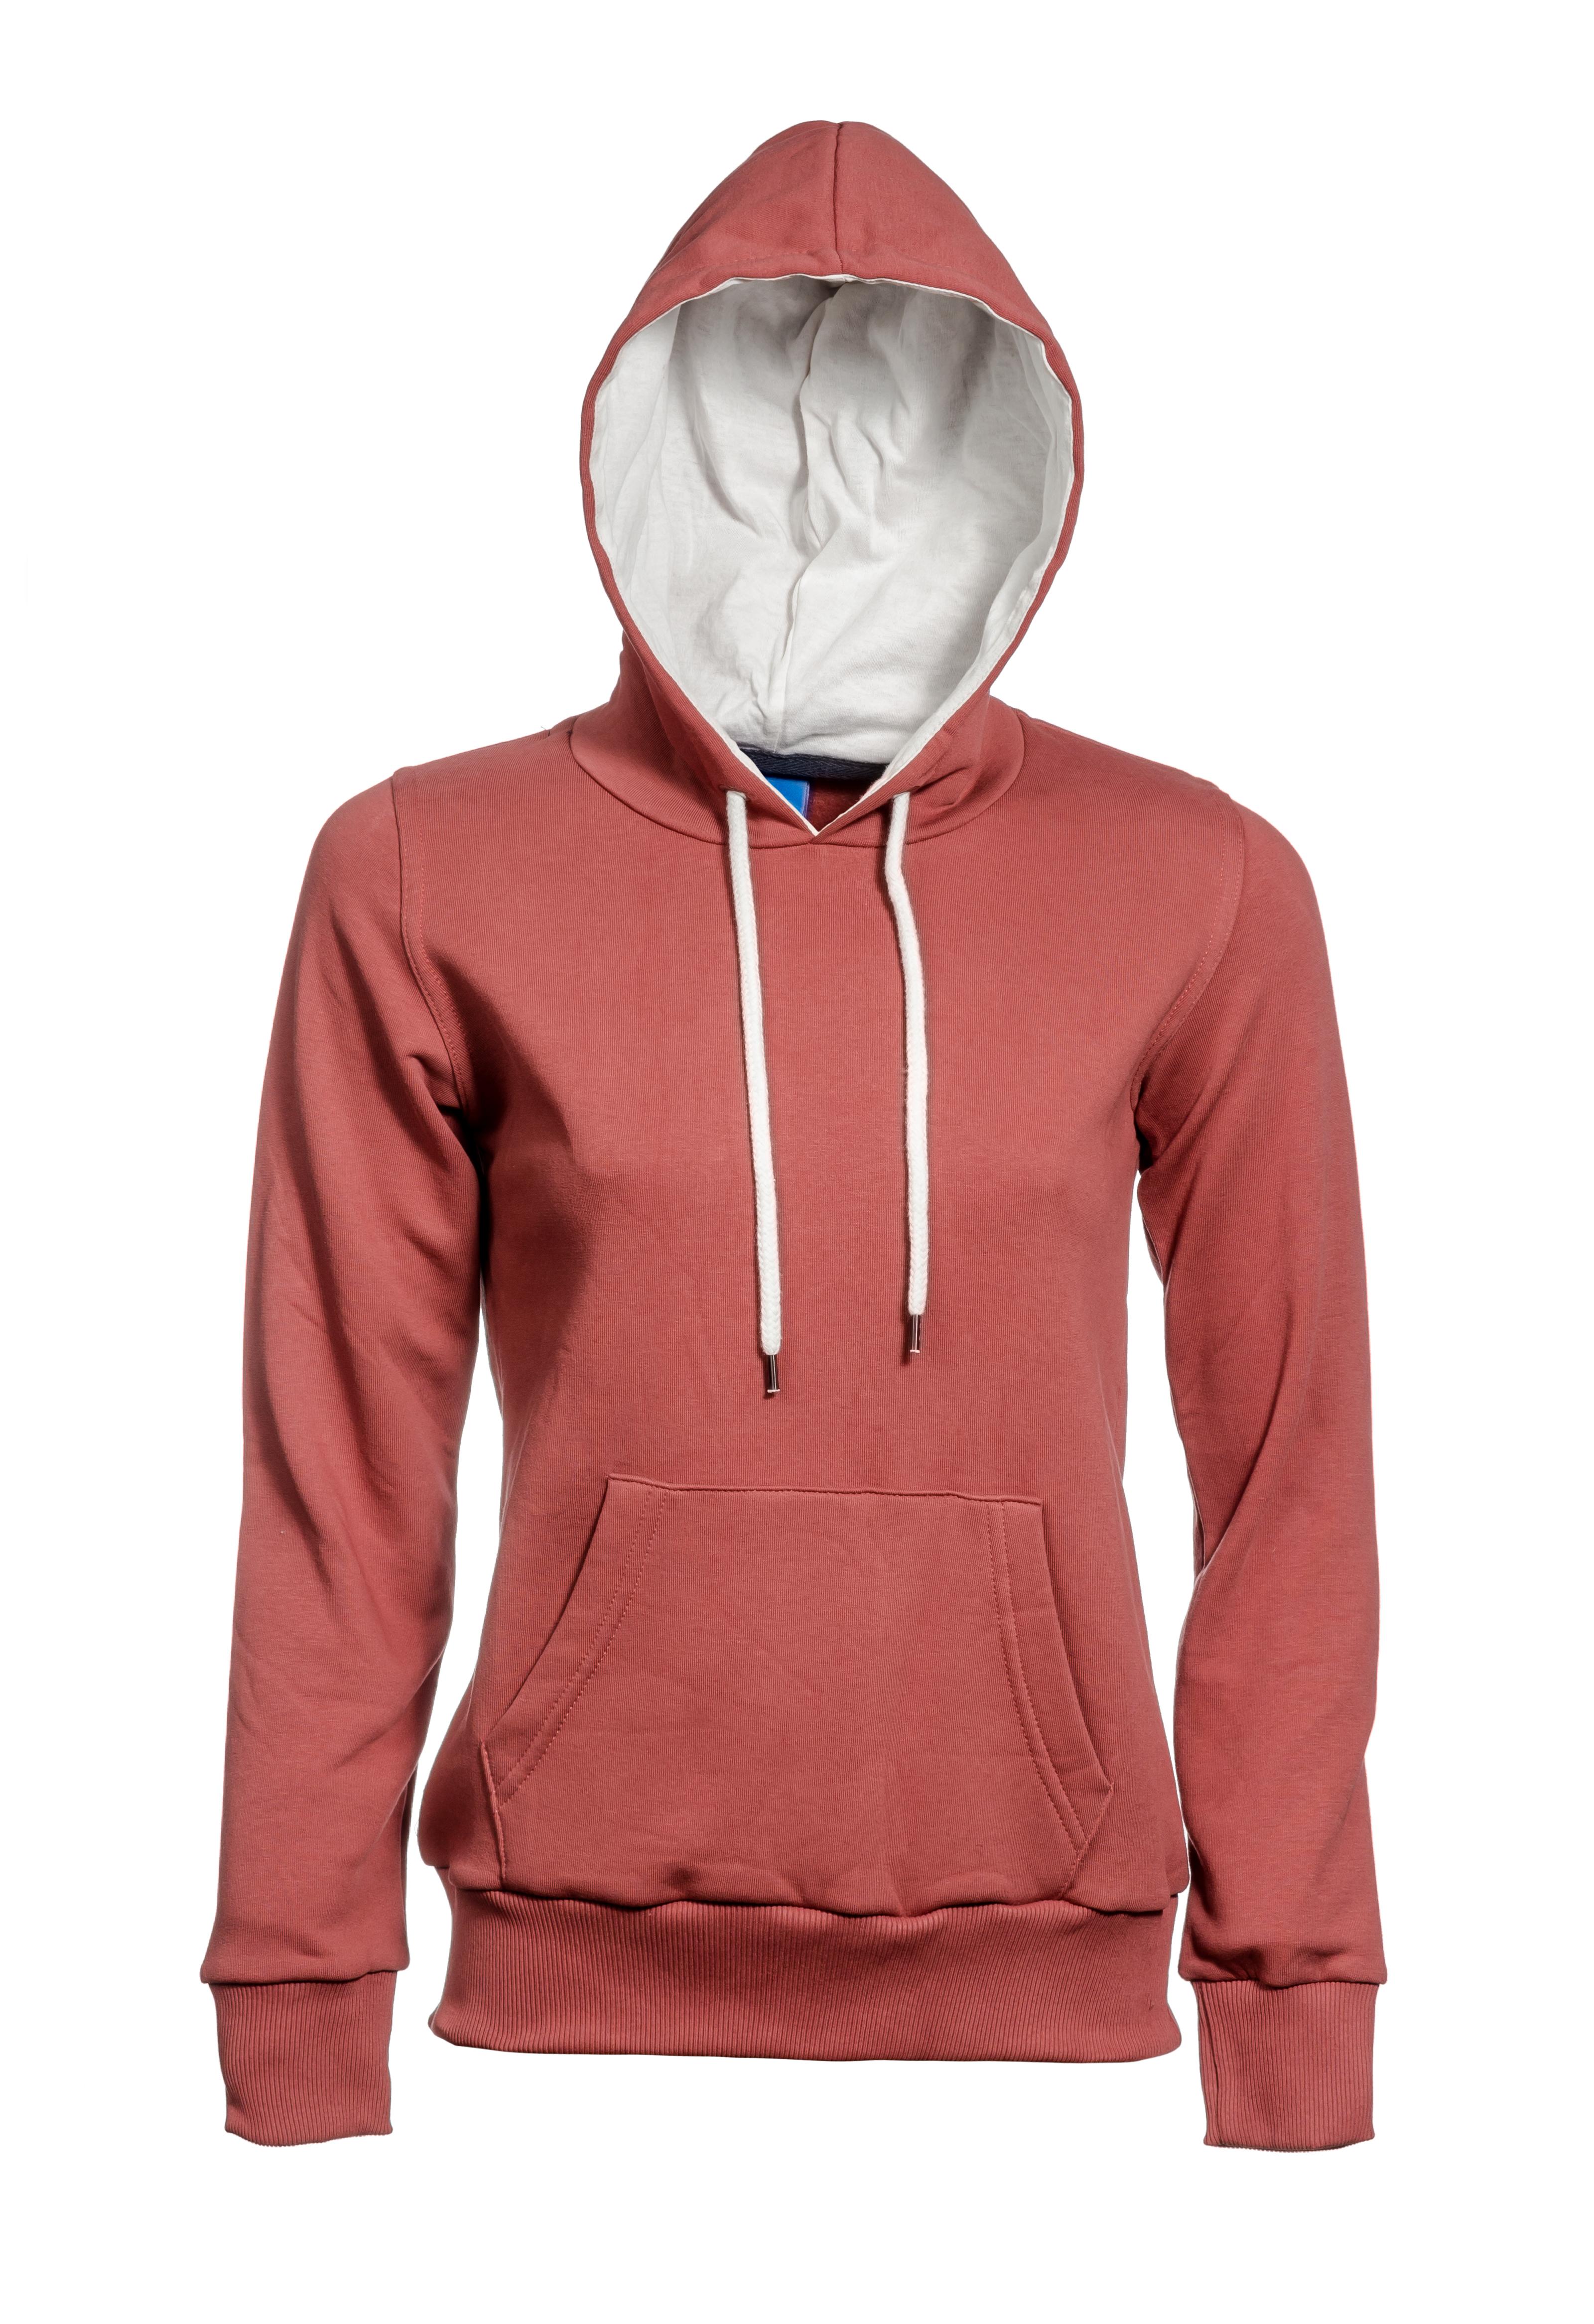 Custom made sweatshirts with hood (2)